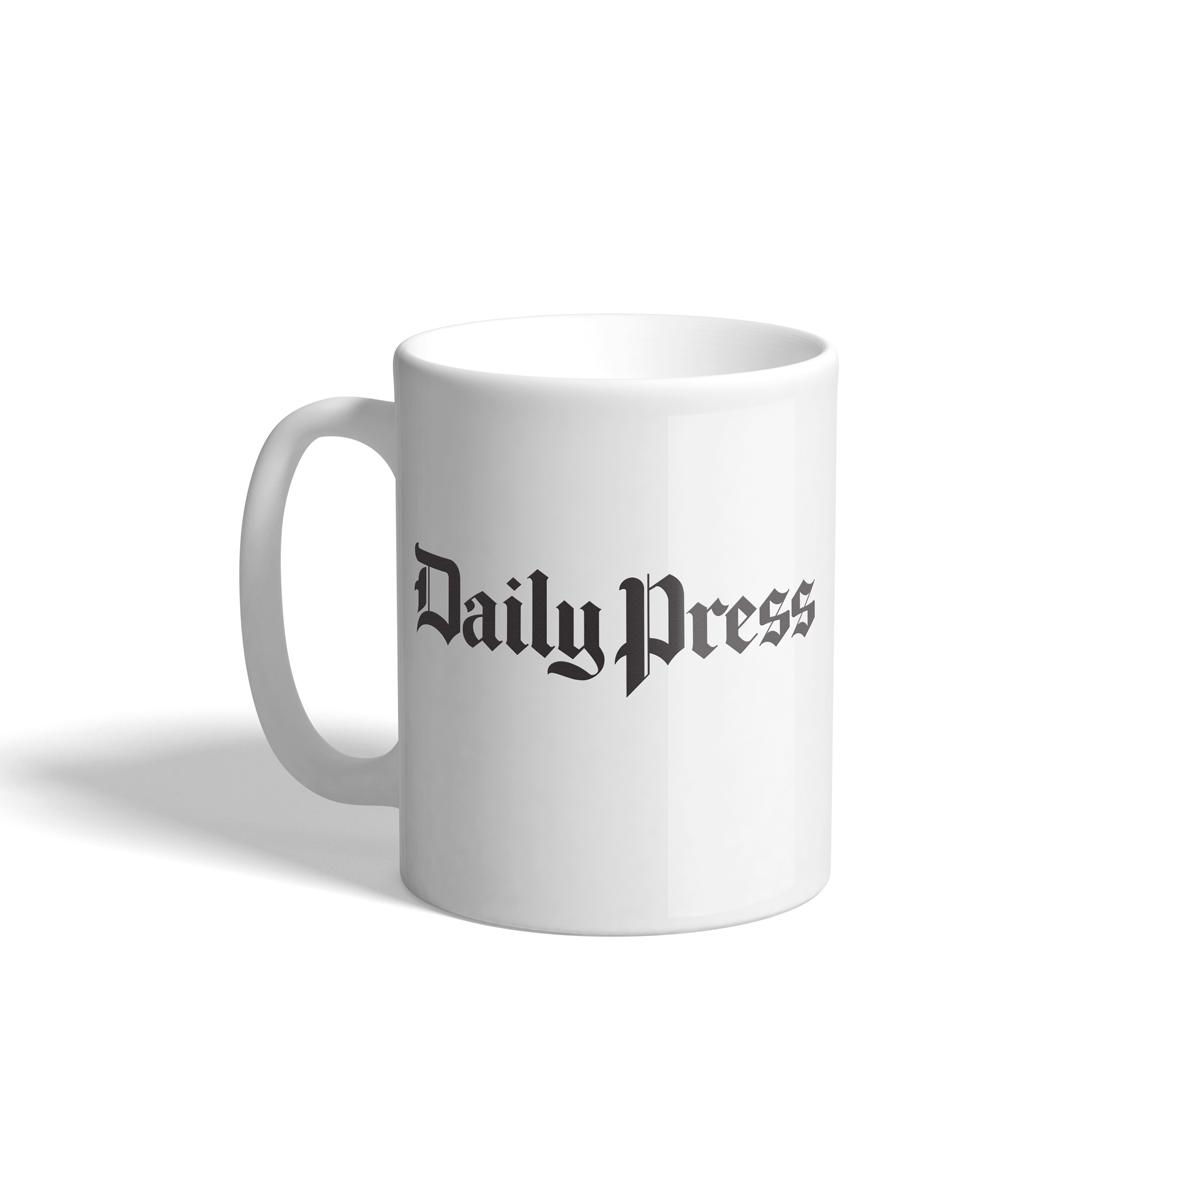 Daily Press Mug